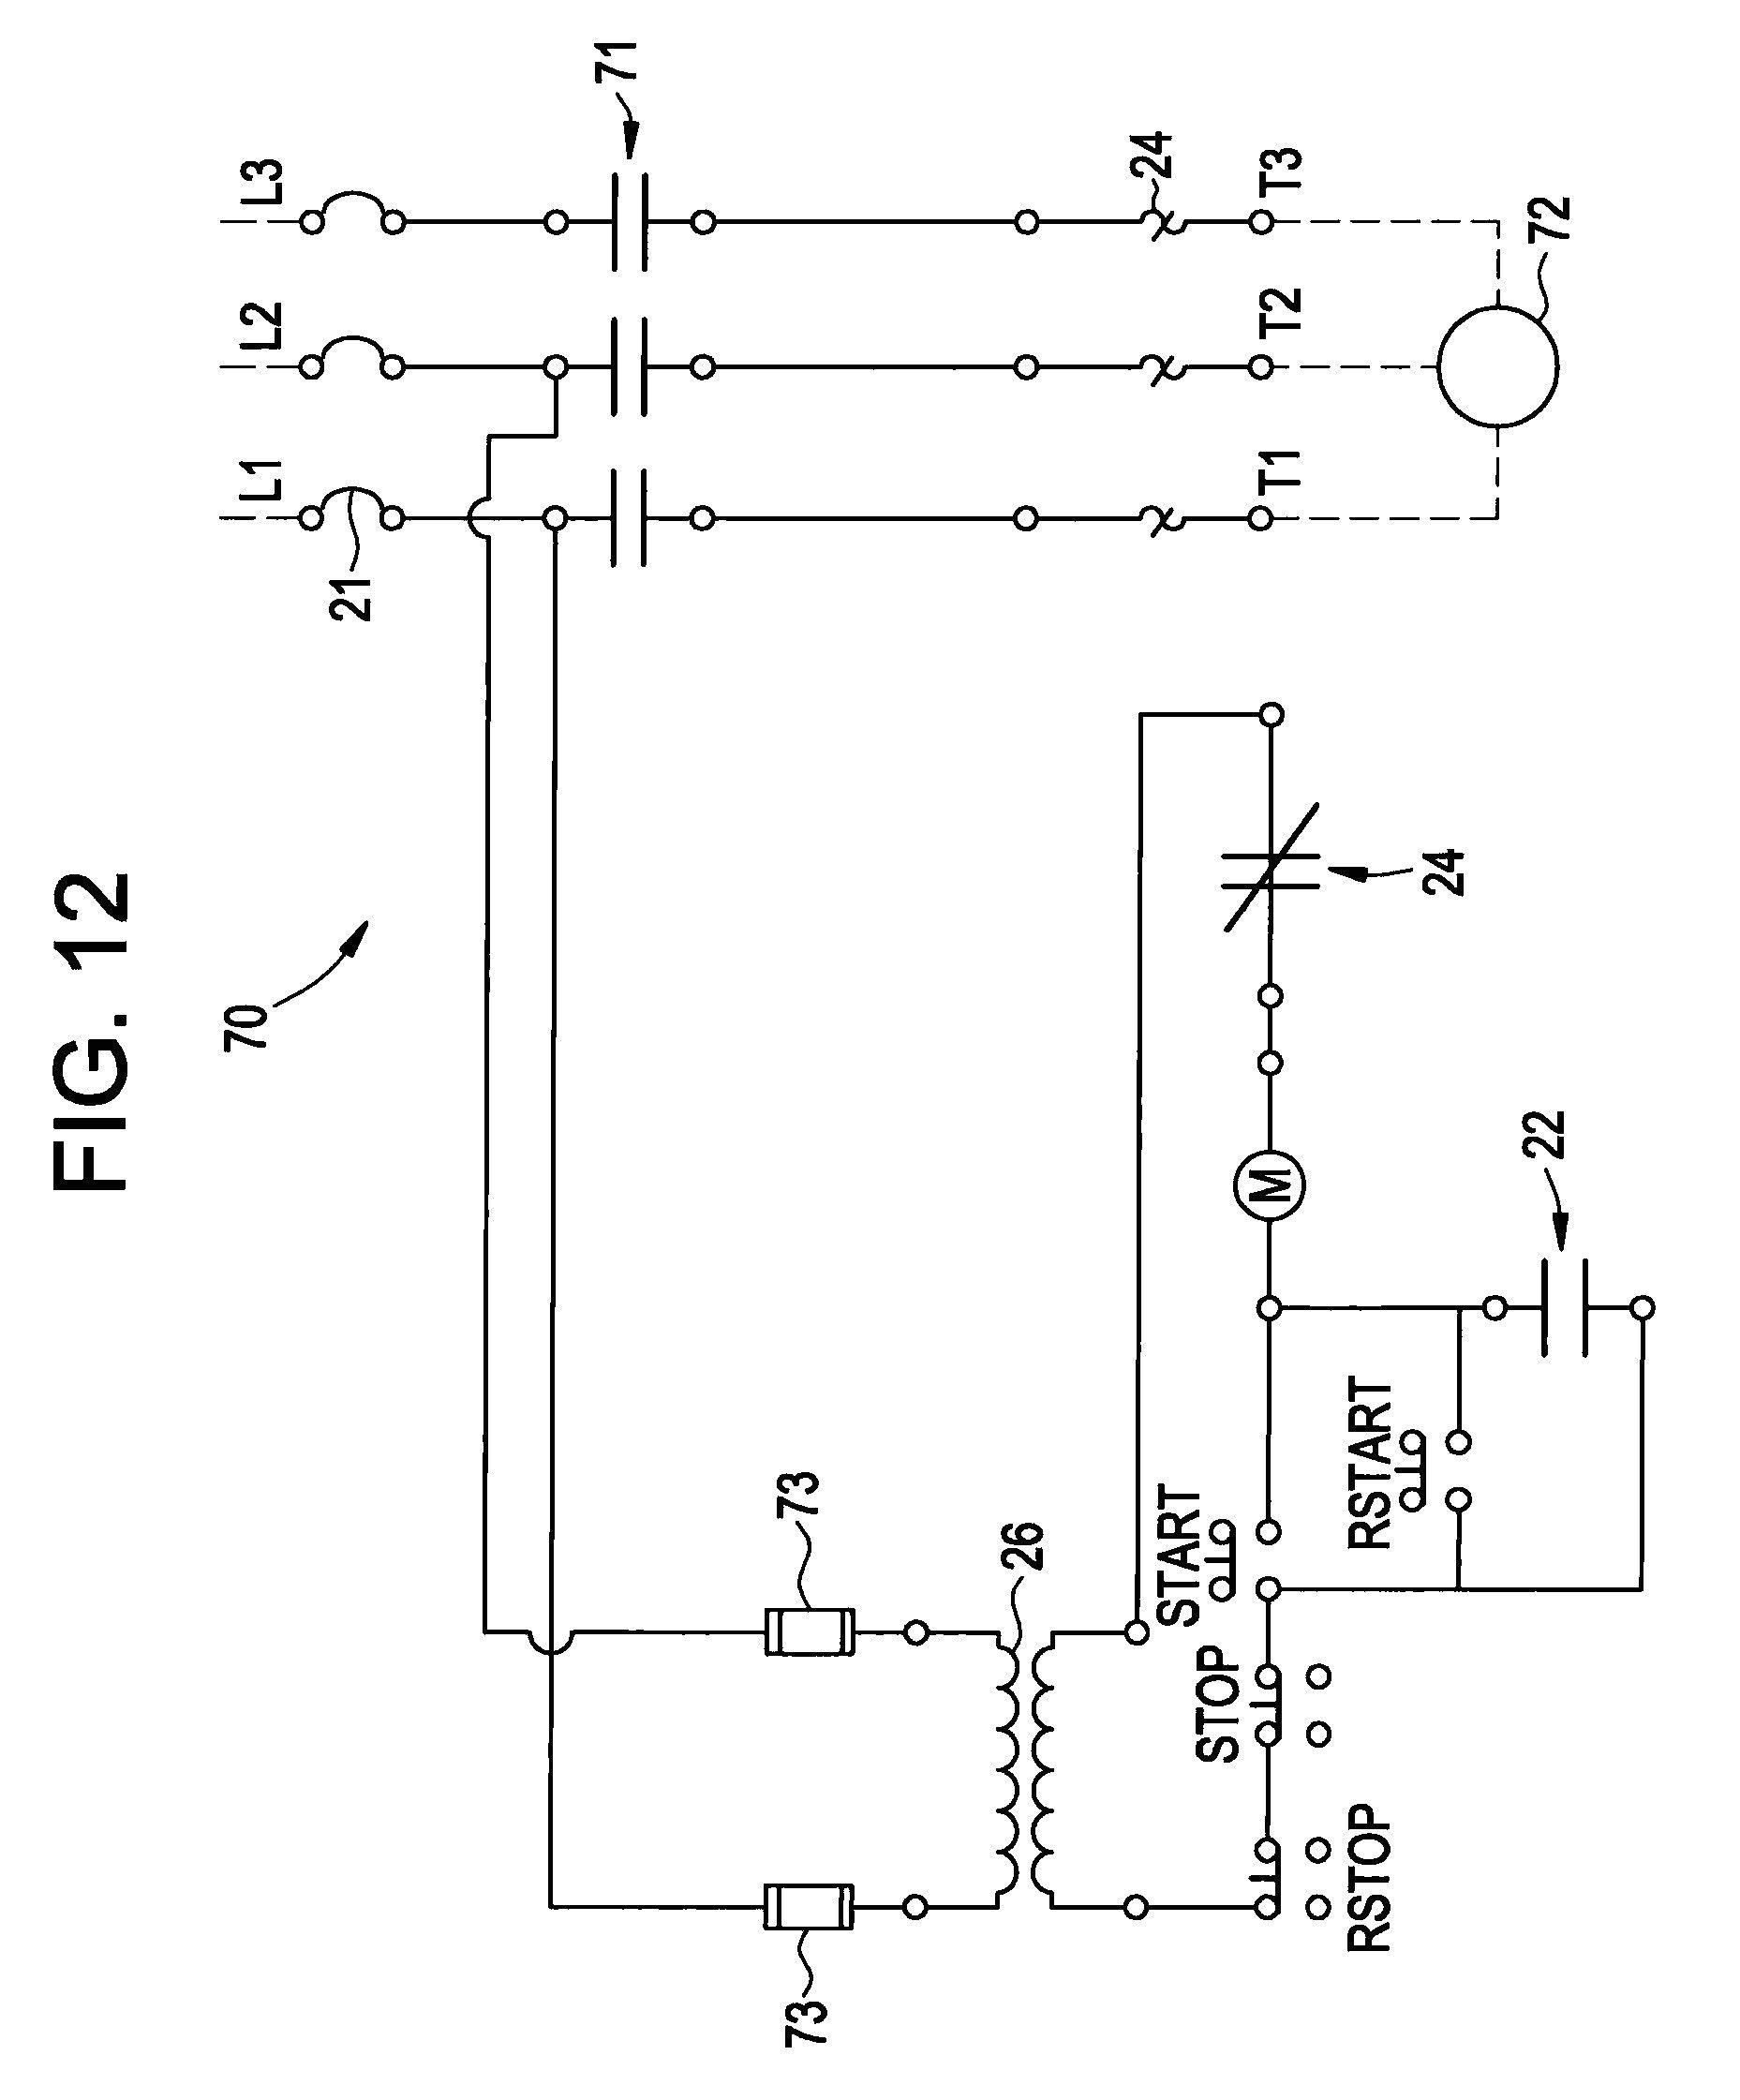 new wiring diagram for auto transformers diagram diagramtemplate diagramsample